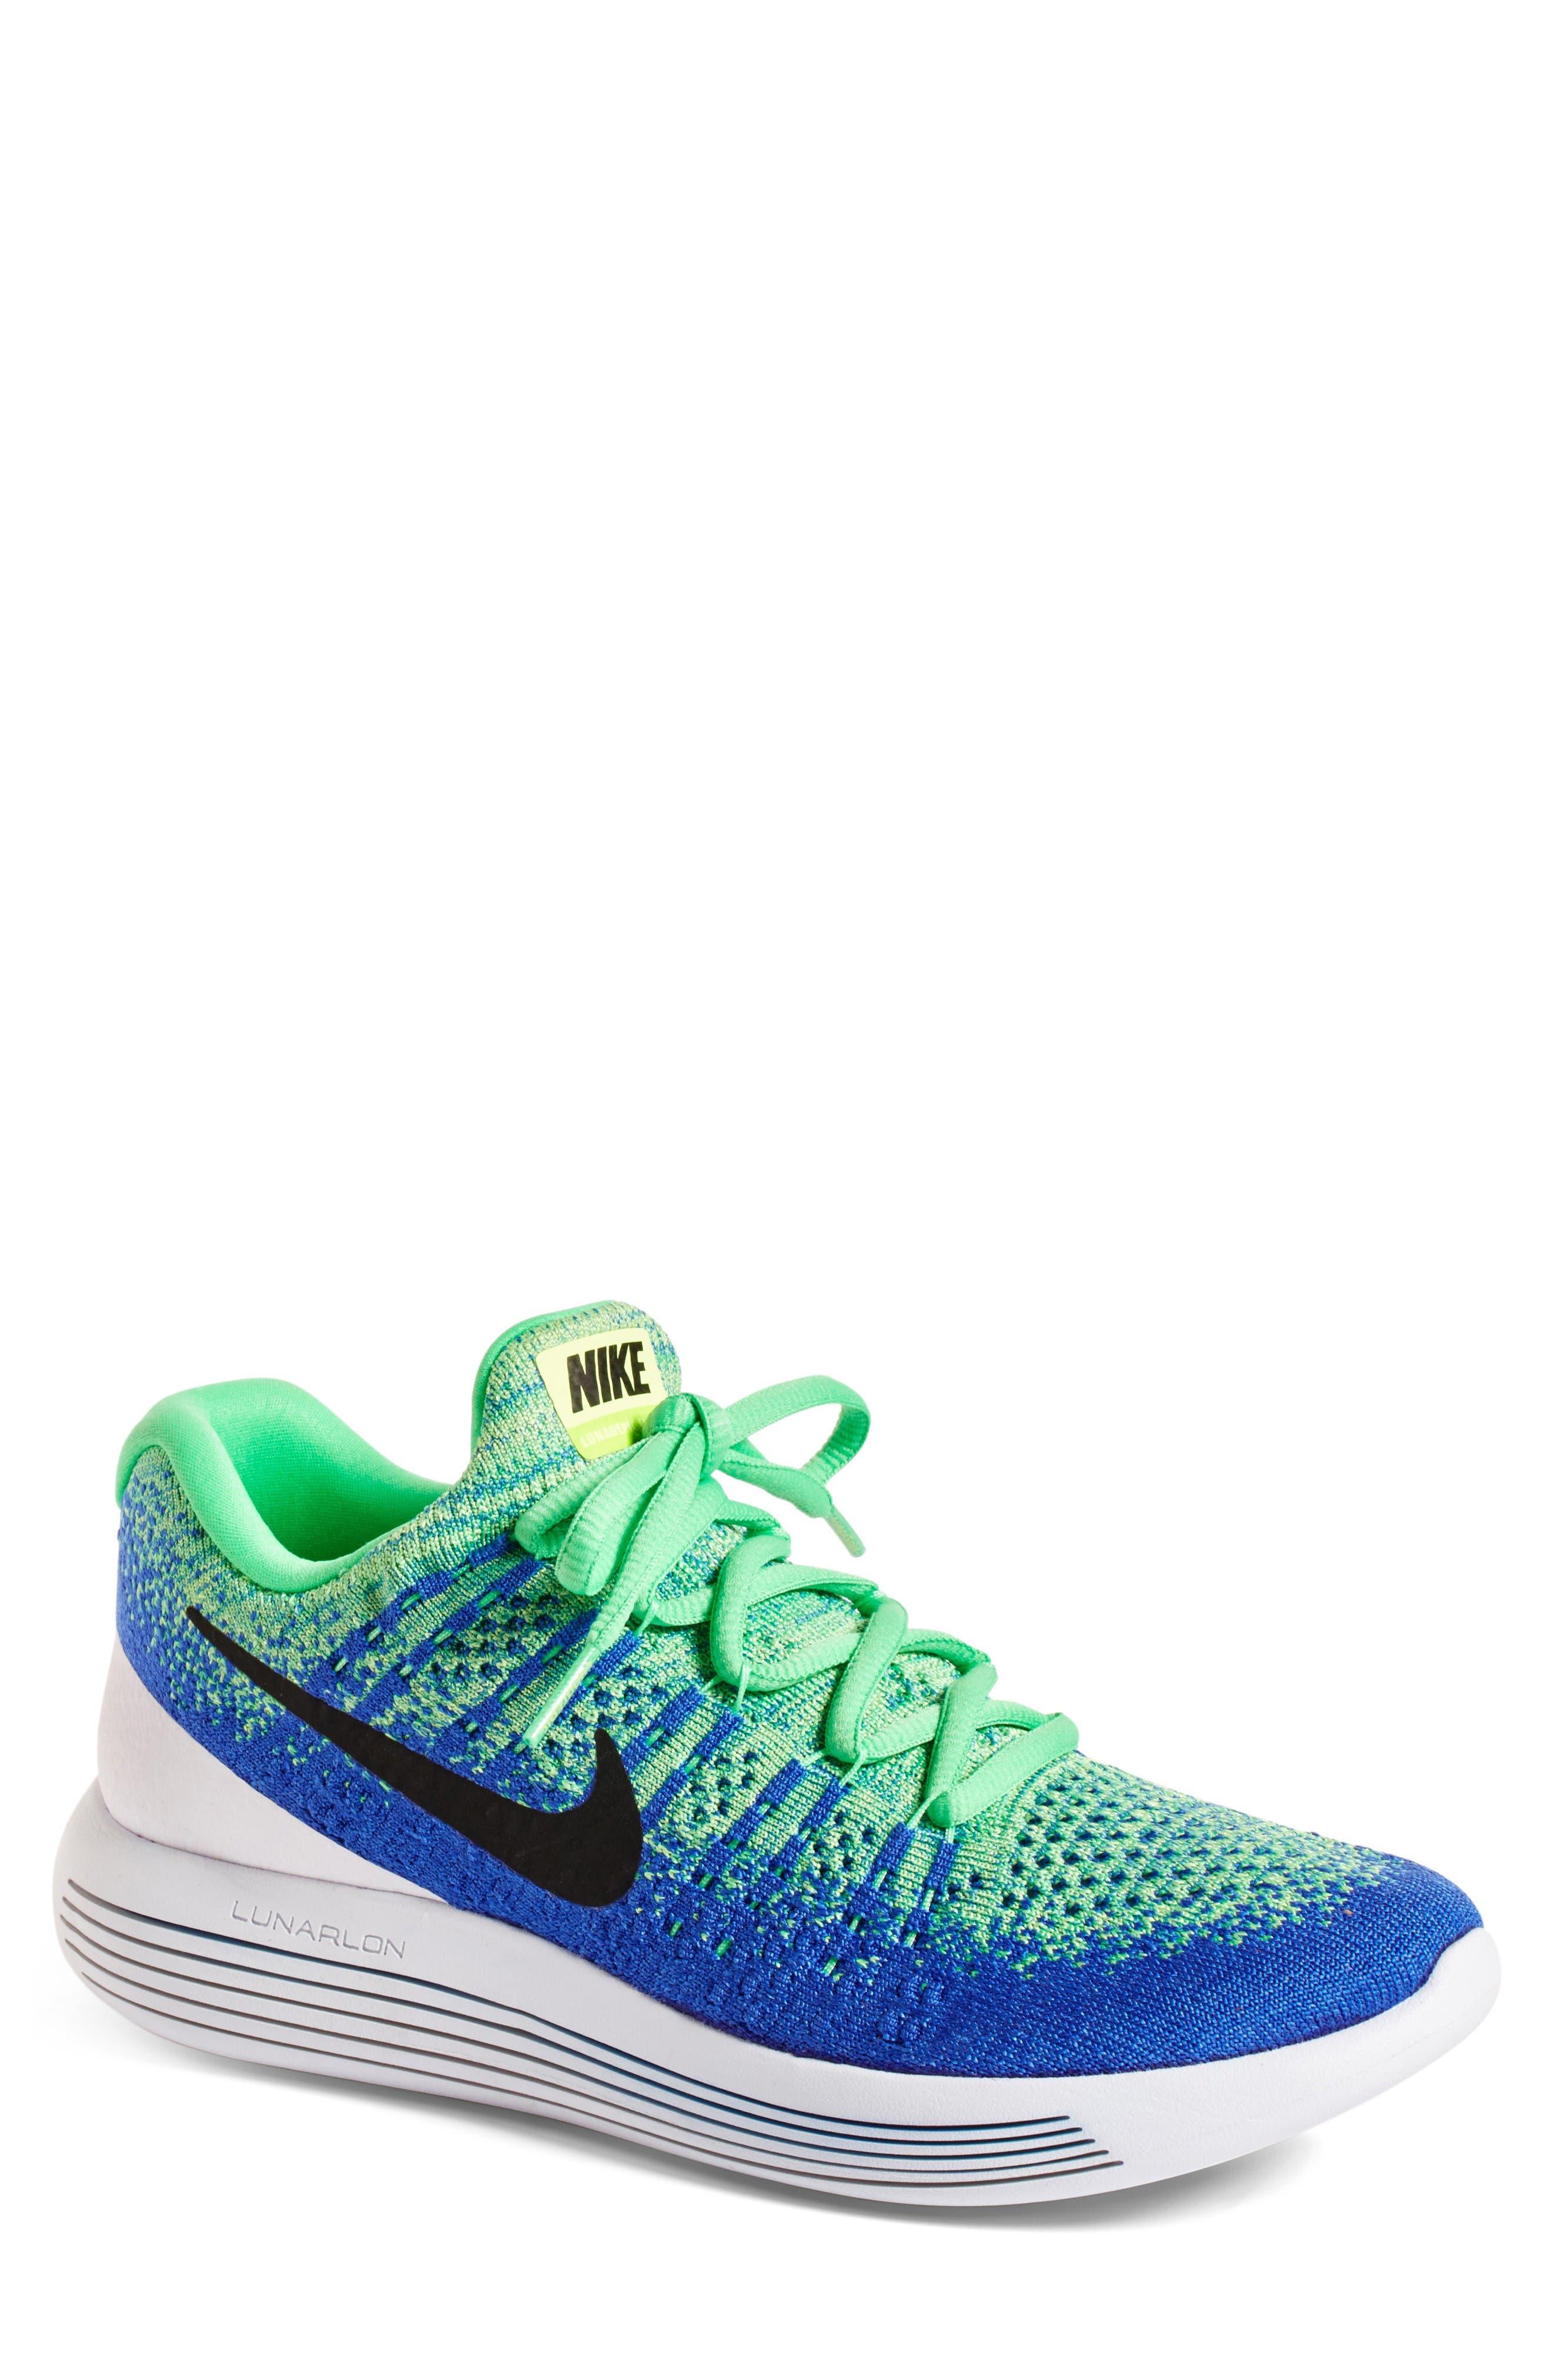 Flyknit 2 LunarEpic Running Shoe,                             Main thumbnail 1, color,                             Electro Green/ Black/ Blue